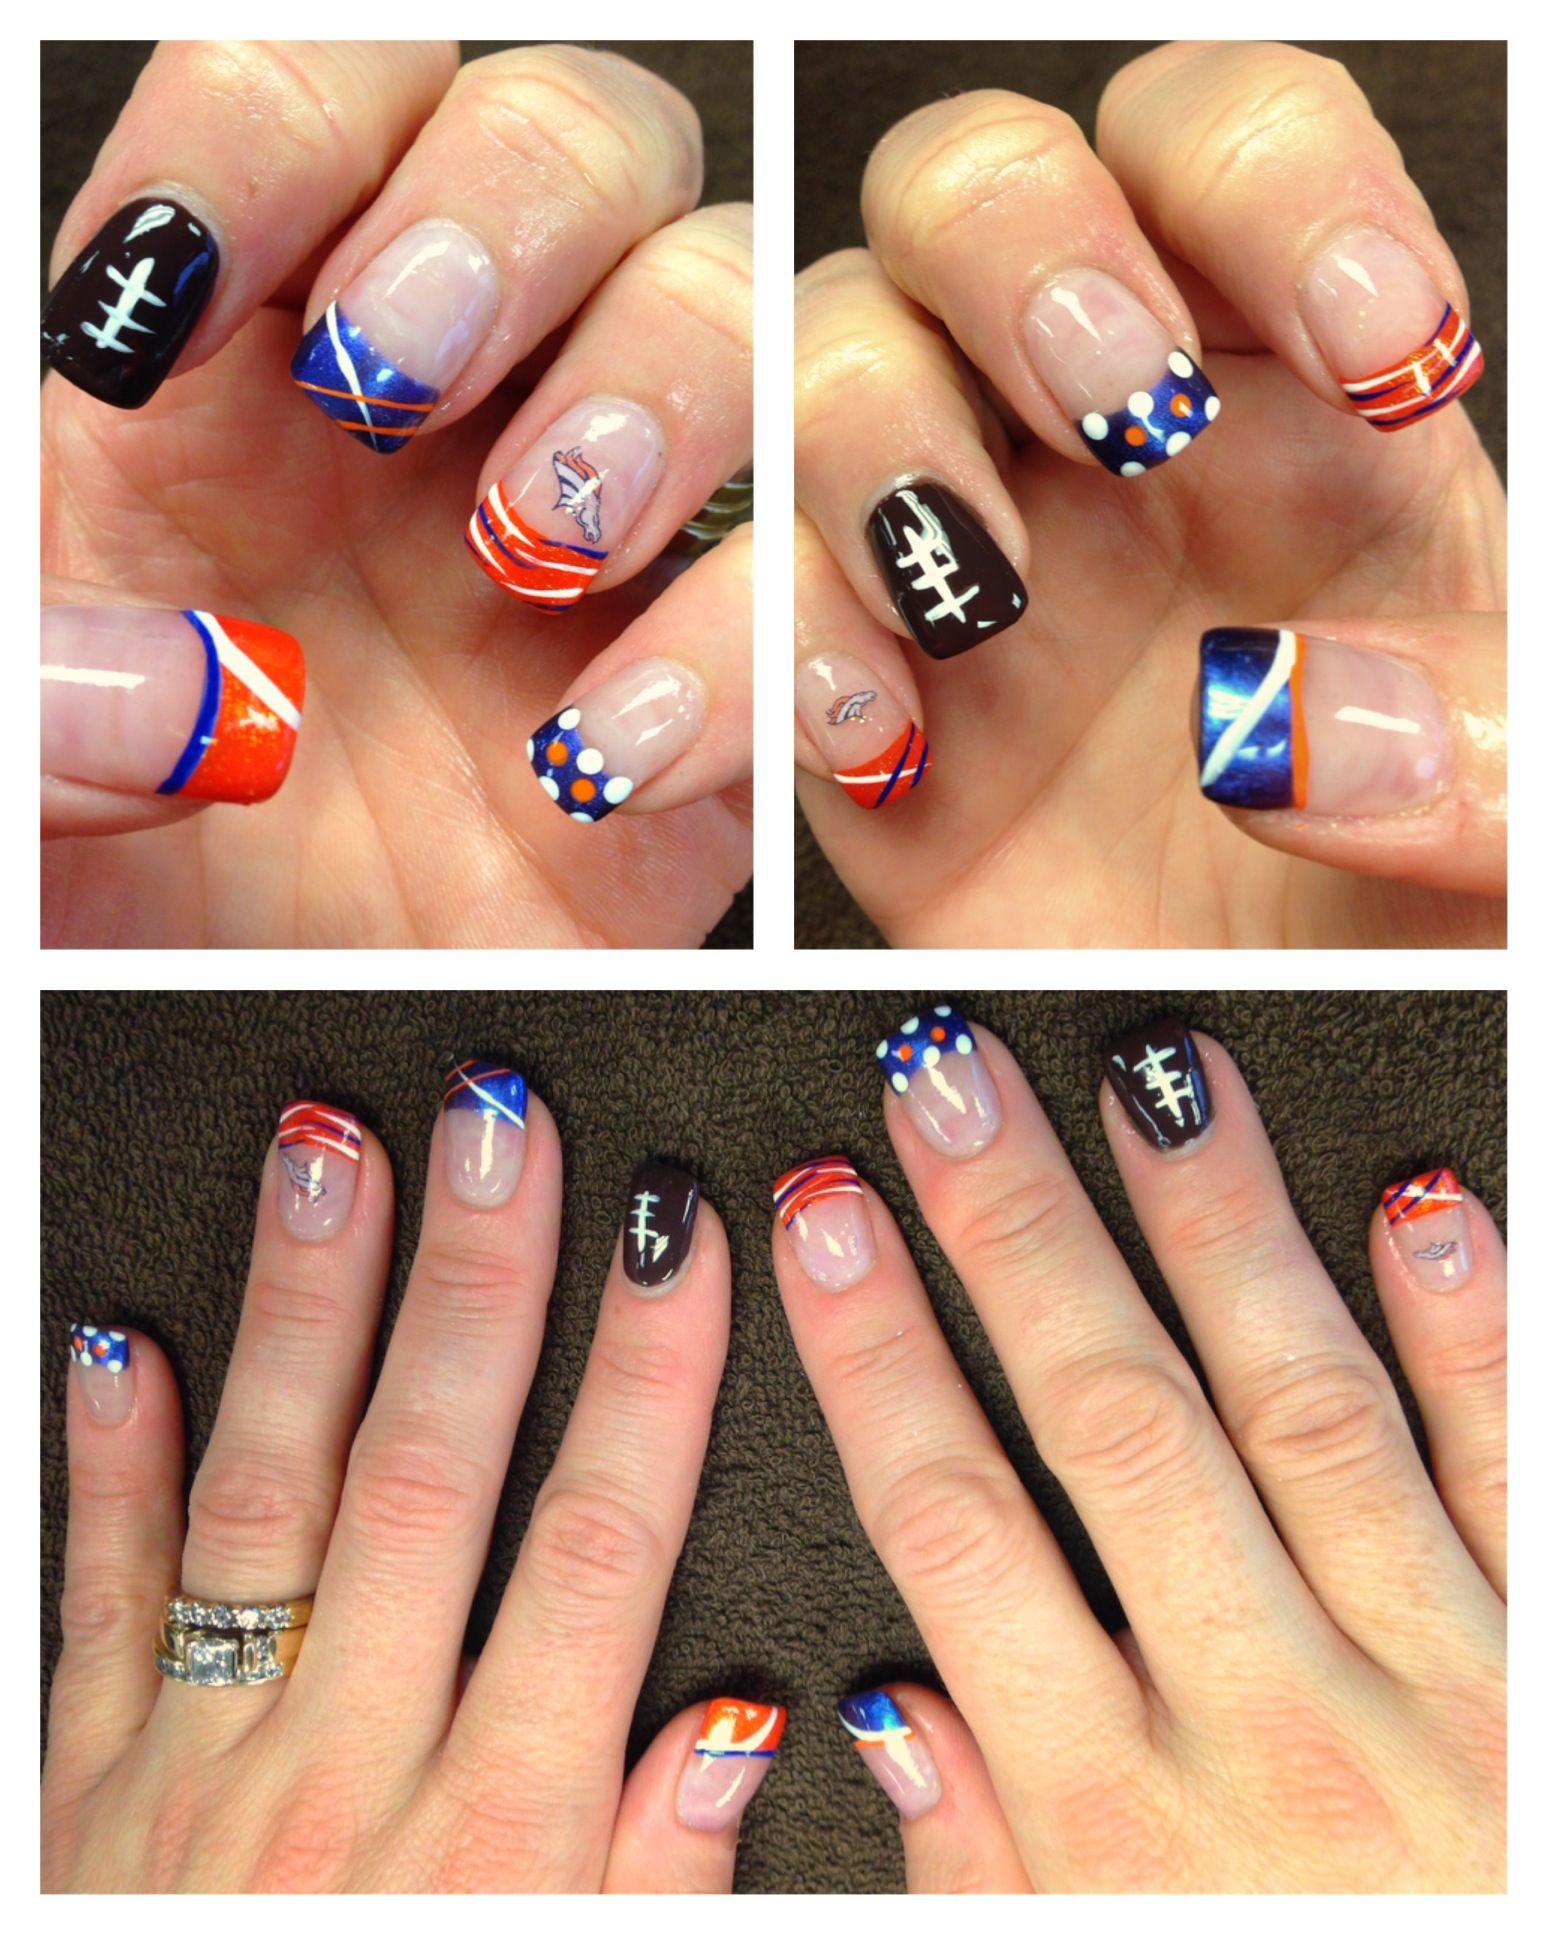 My acrylic nails for Super Bowl 48! GO BRONCOS!!! Nail art, Denver ...